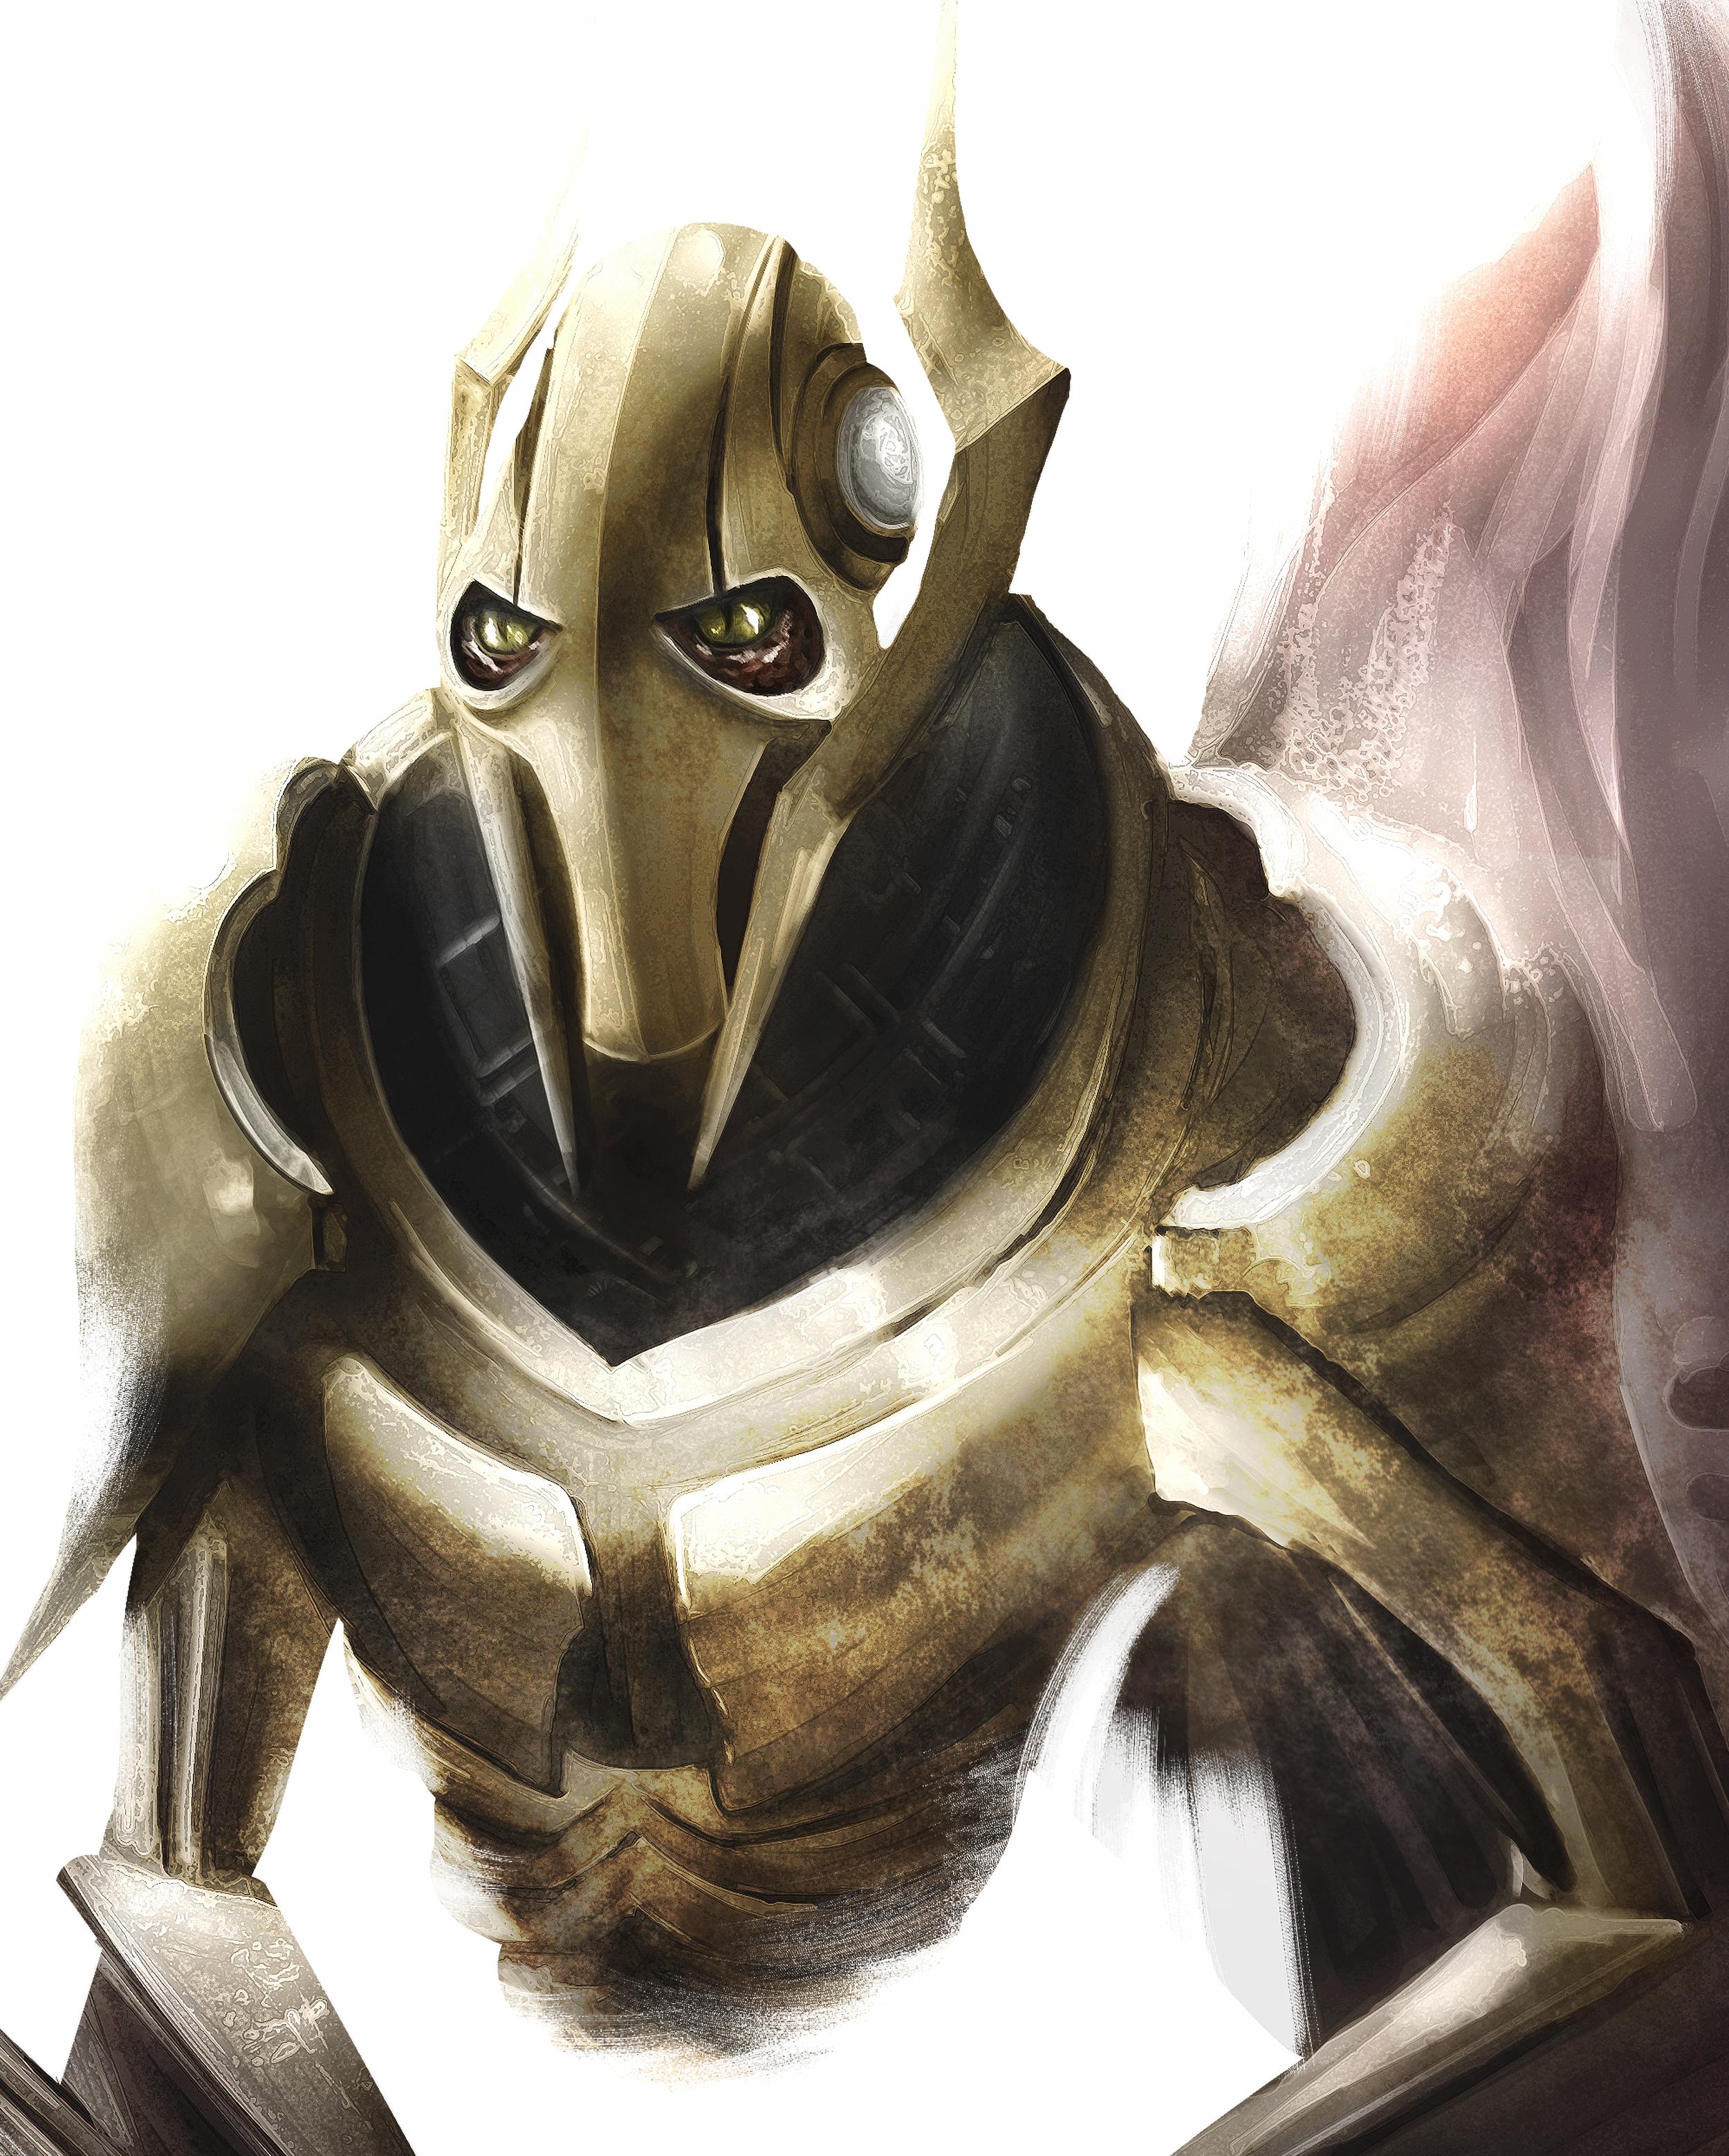 general Grievous fanart